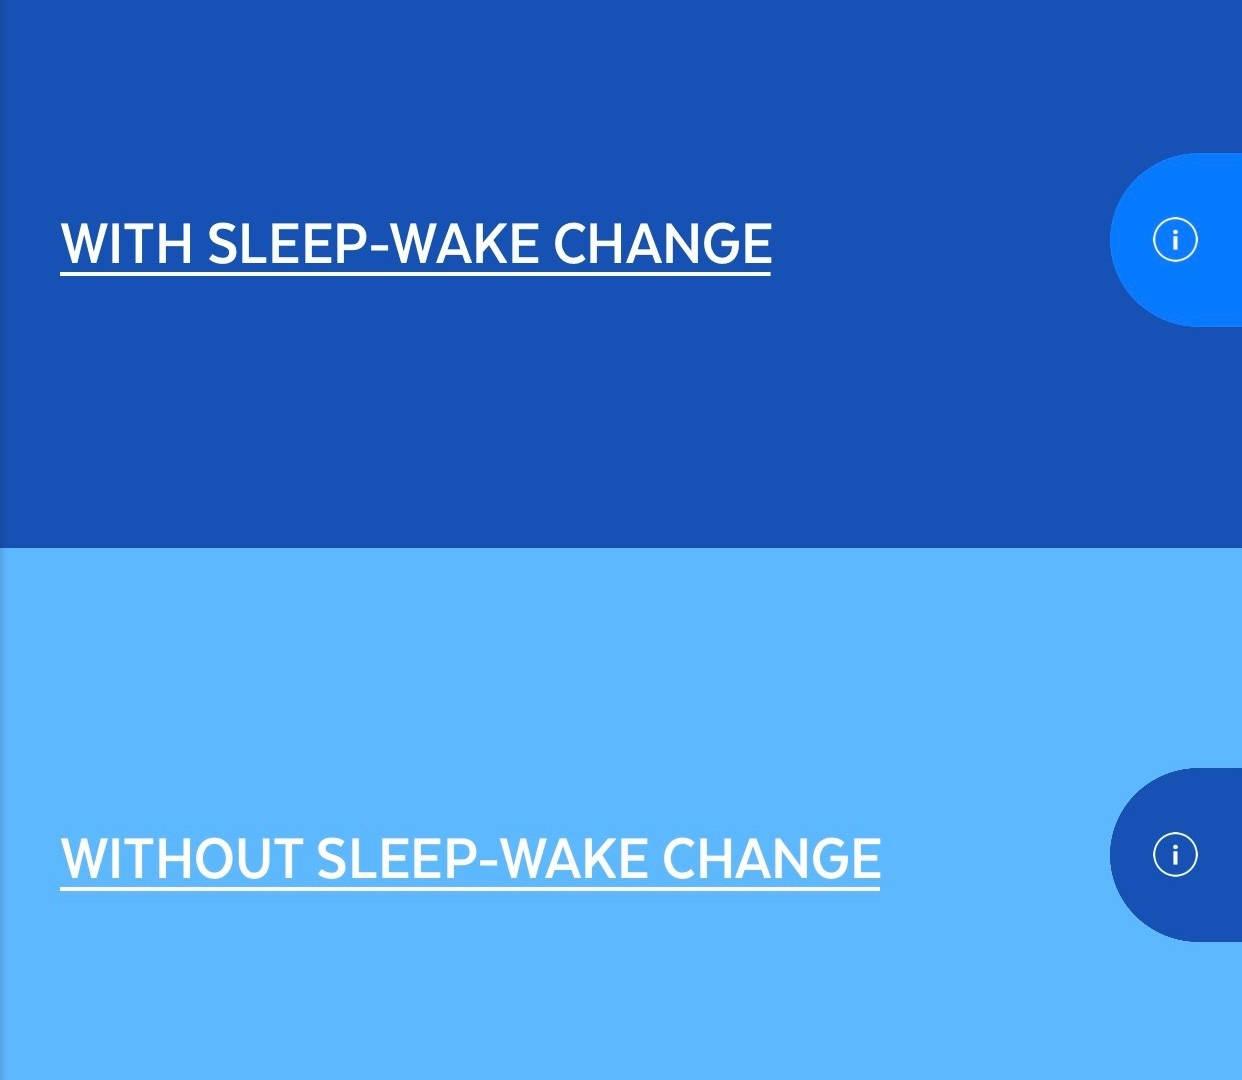 AYO APP HAS A SLEEP WAKE PROGRAM